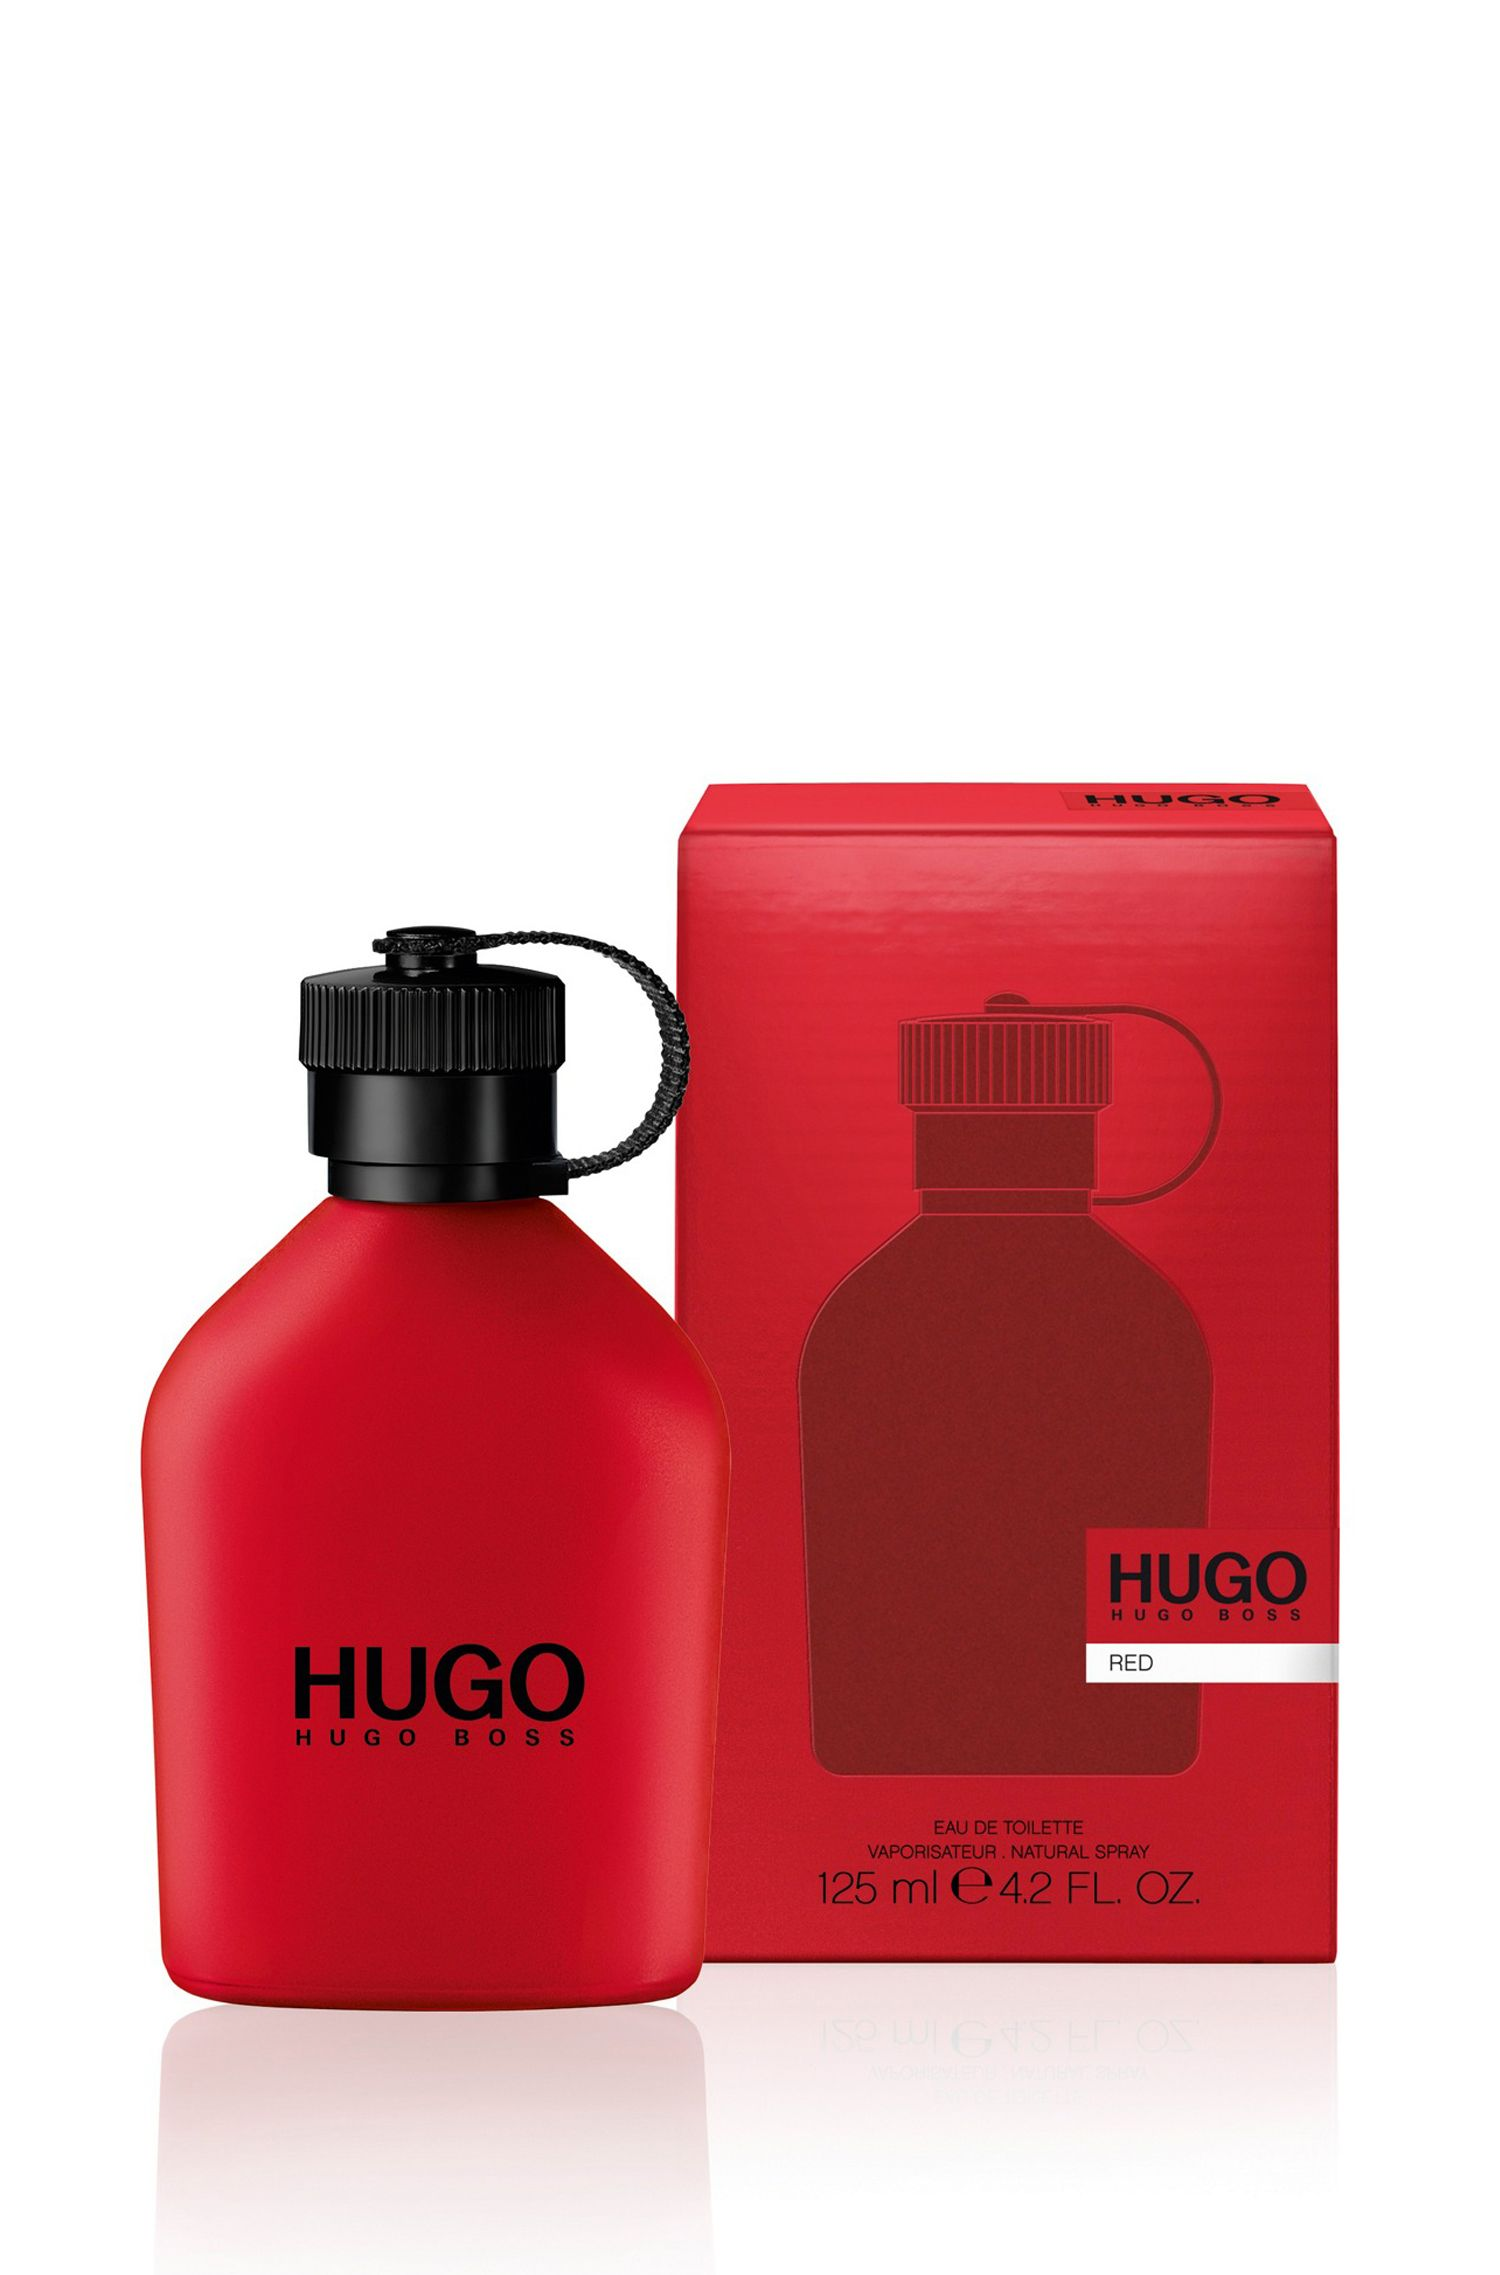 4.2 fl. oz. (125 mL) Eau de Toilette | HUGO Red